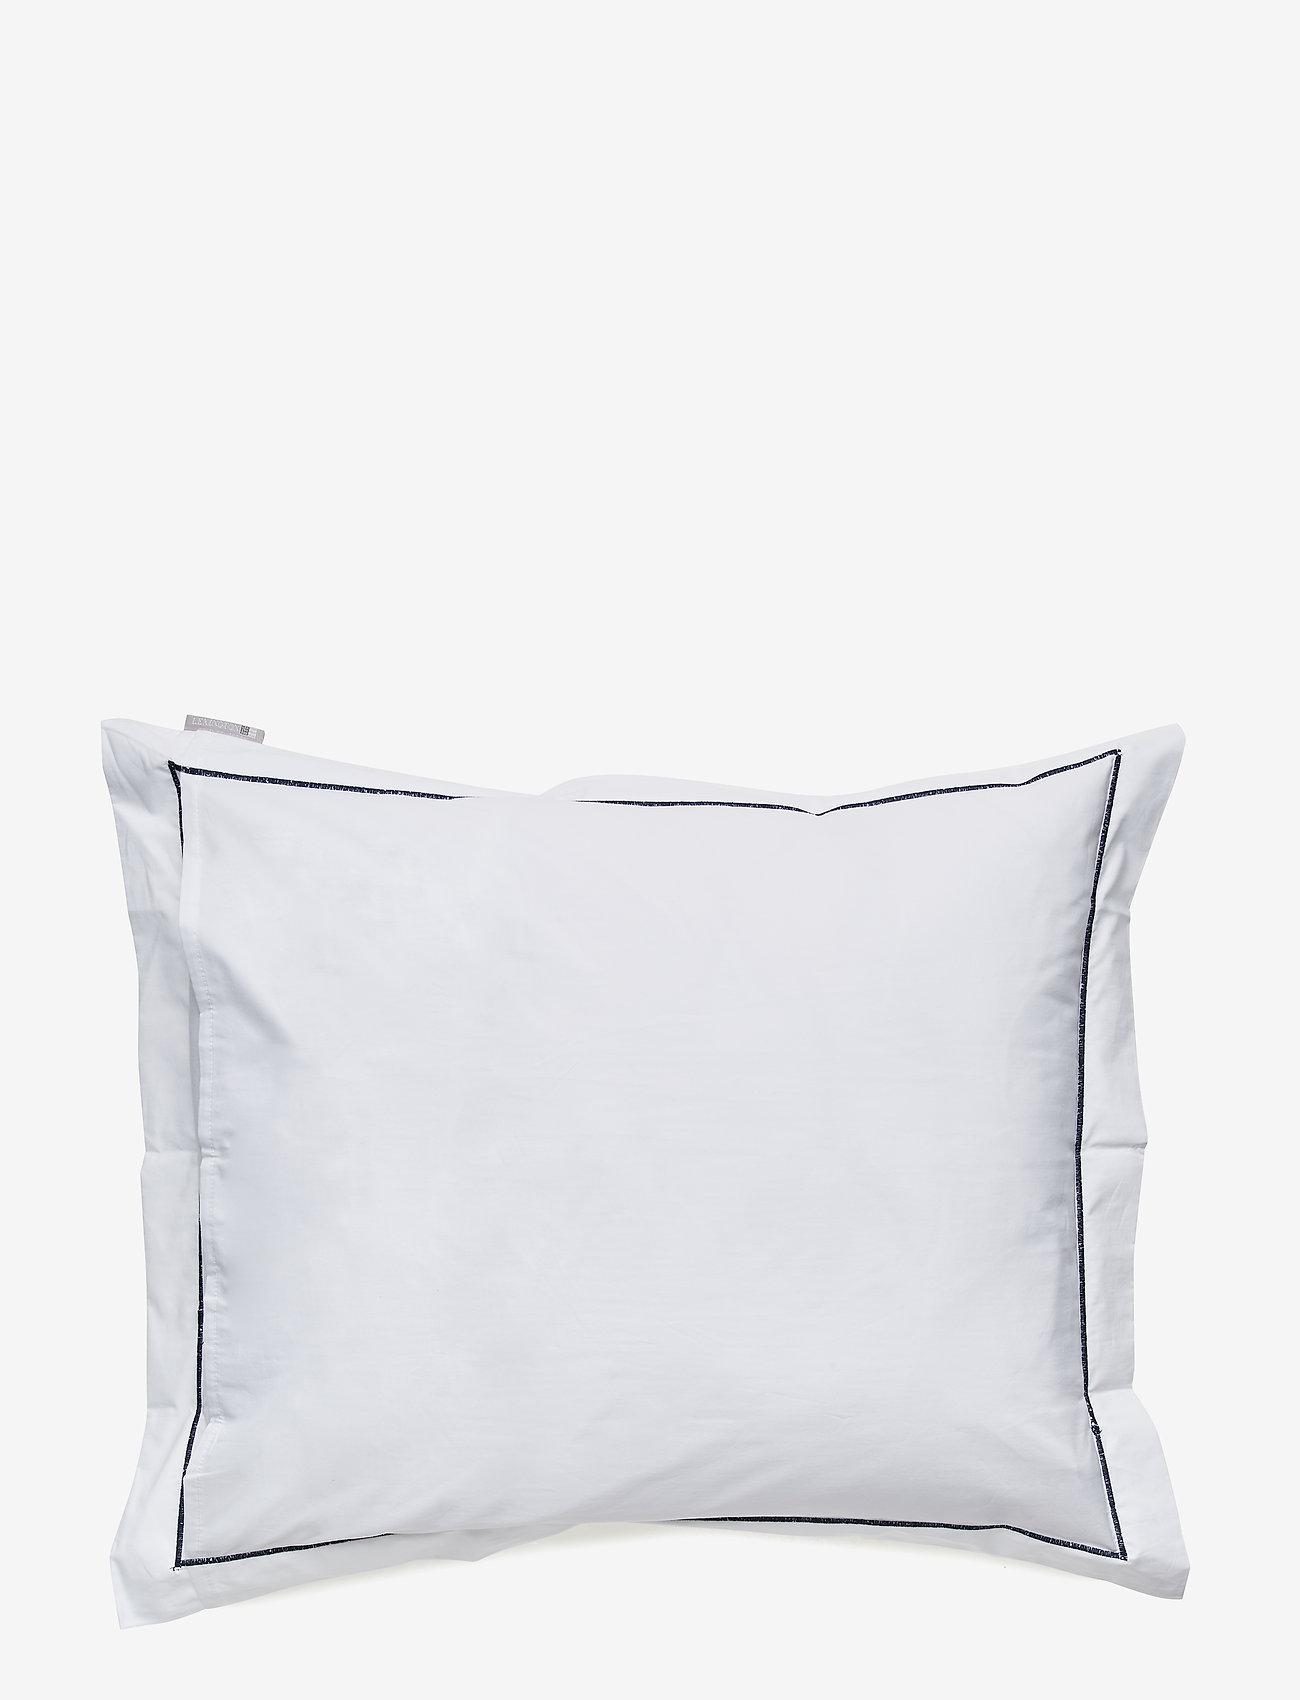 Lexington Home - Hotel Percale White/Blue Pillowcase - taies d'oreiller - white/blue - 1